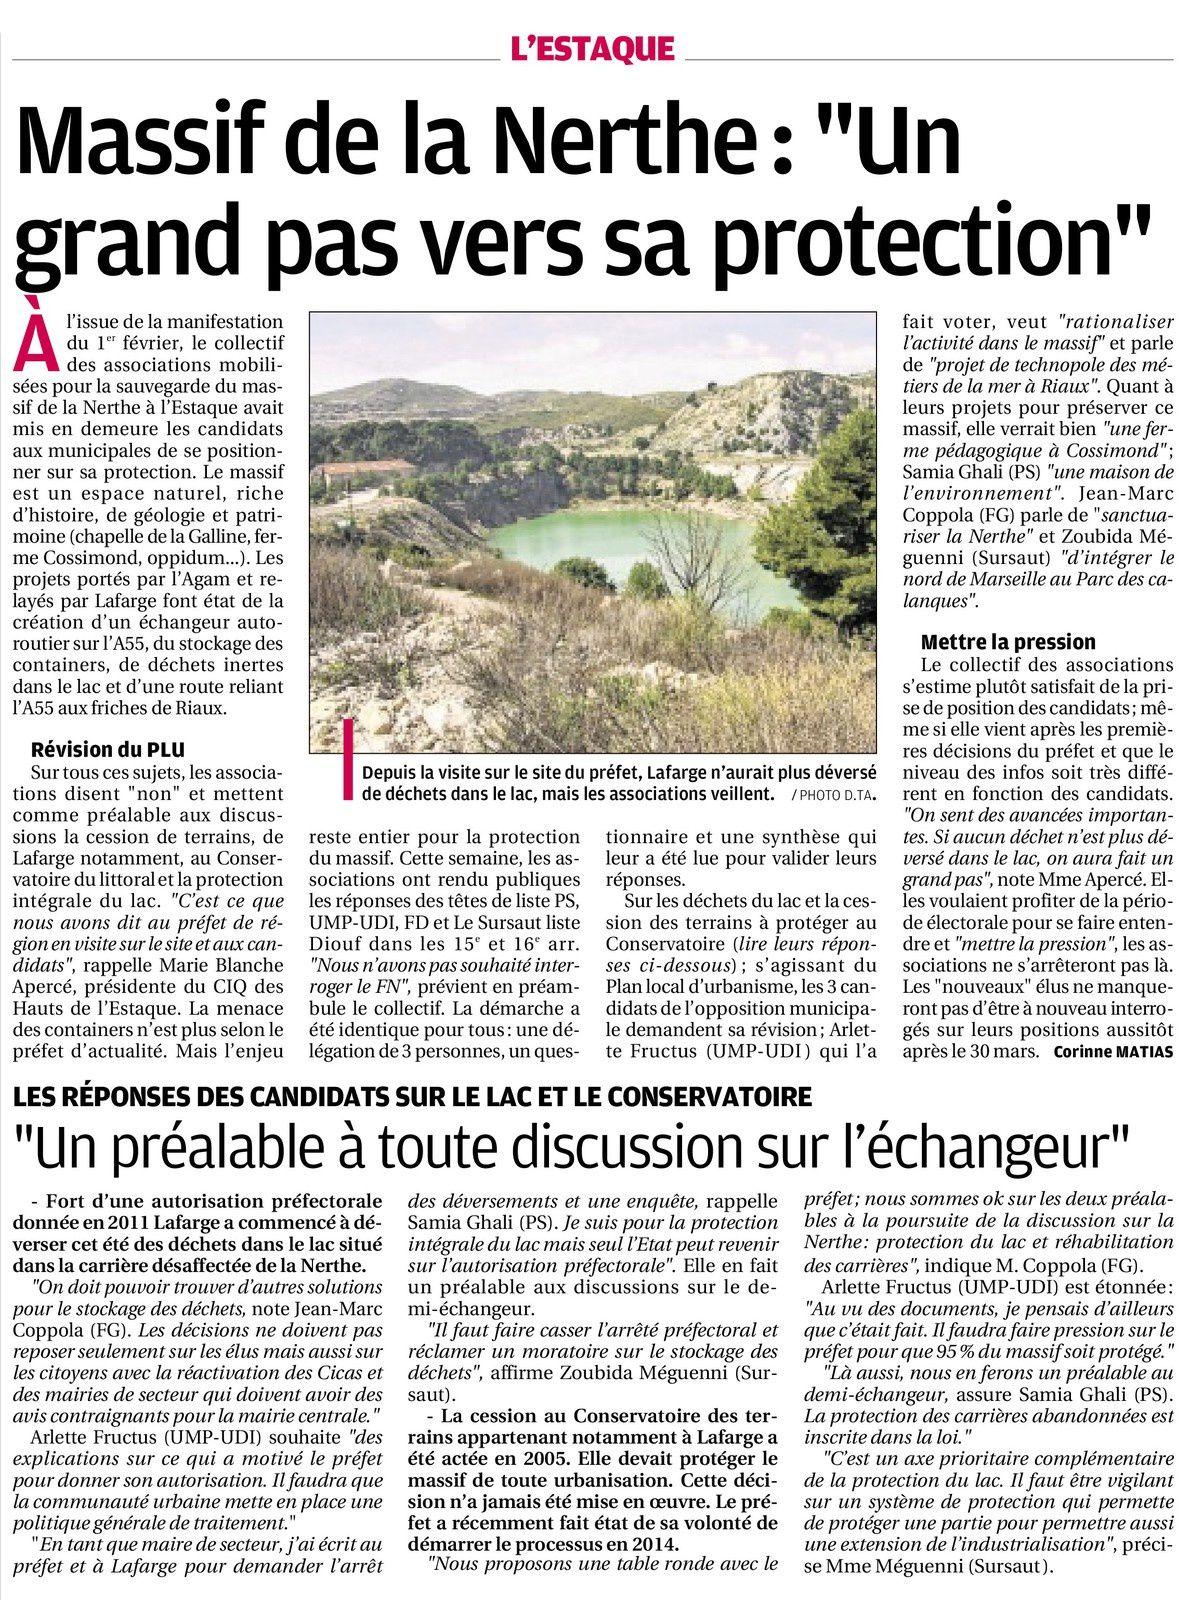 La Provence du 21 mars 2014